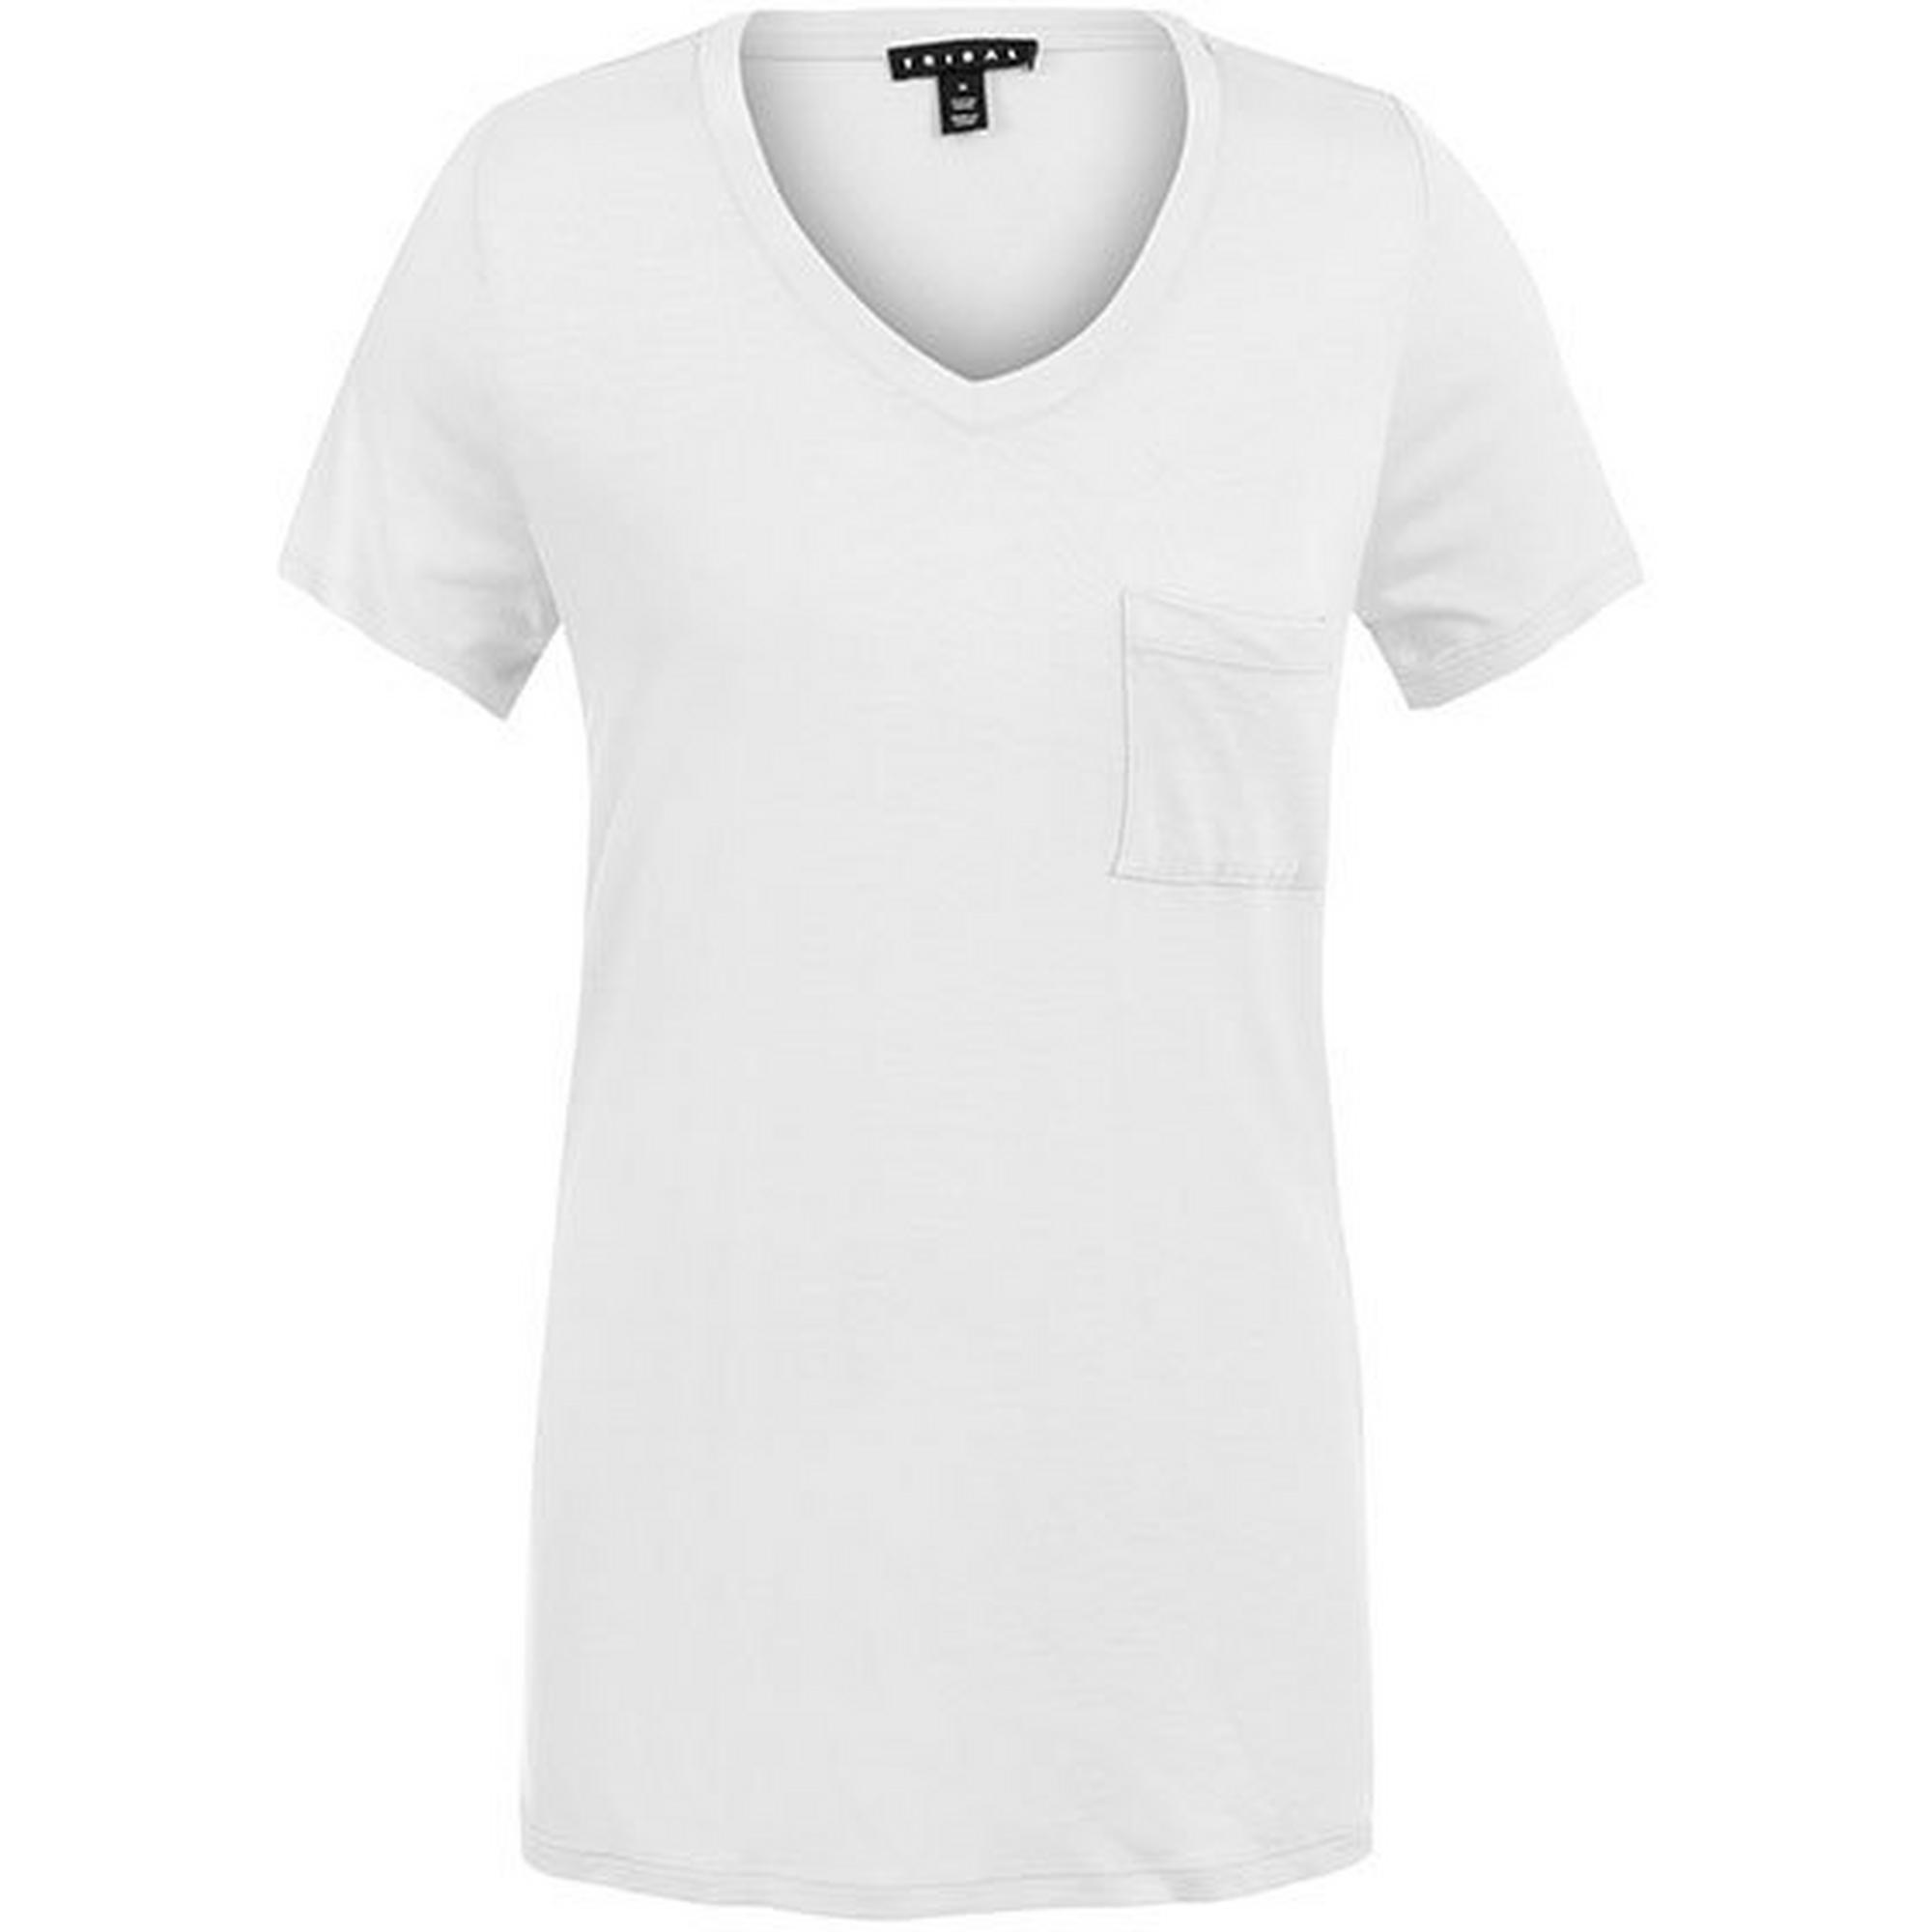 Women's T-Seasonal Essentials Short Sleeve Top